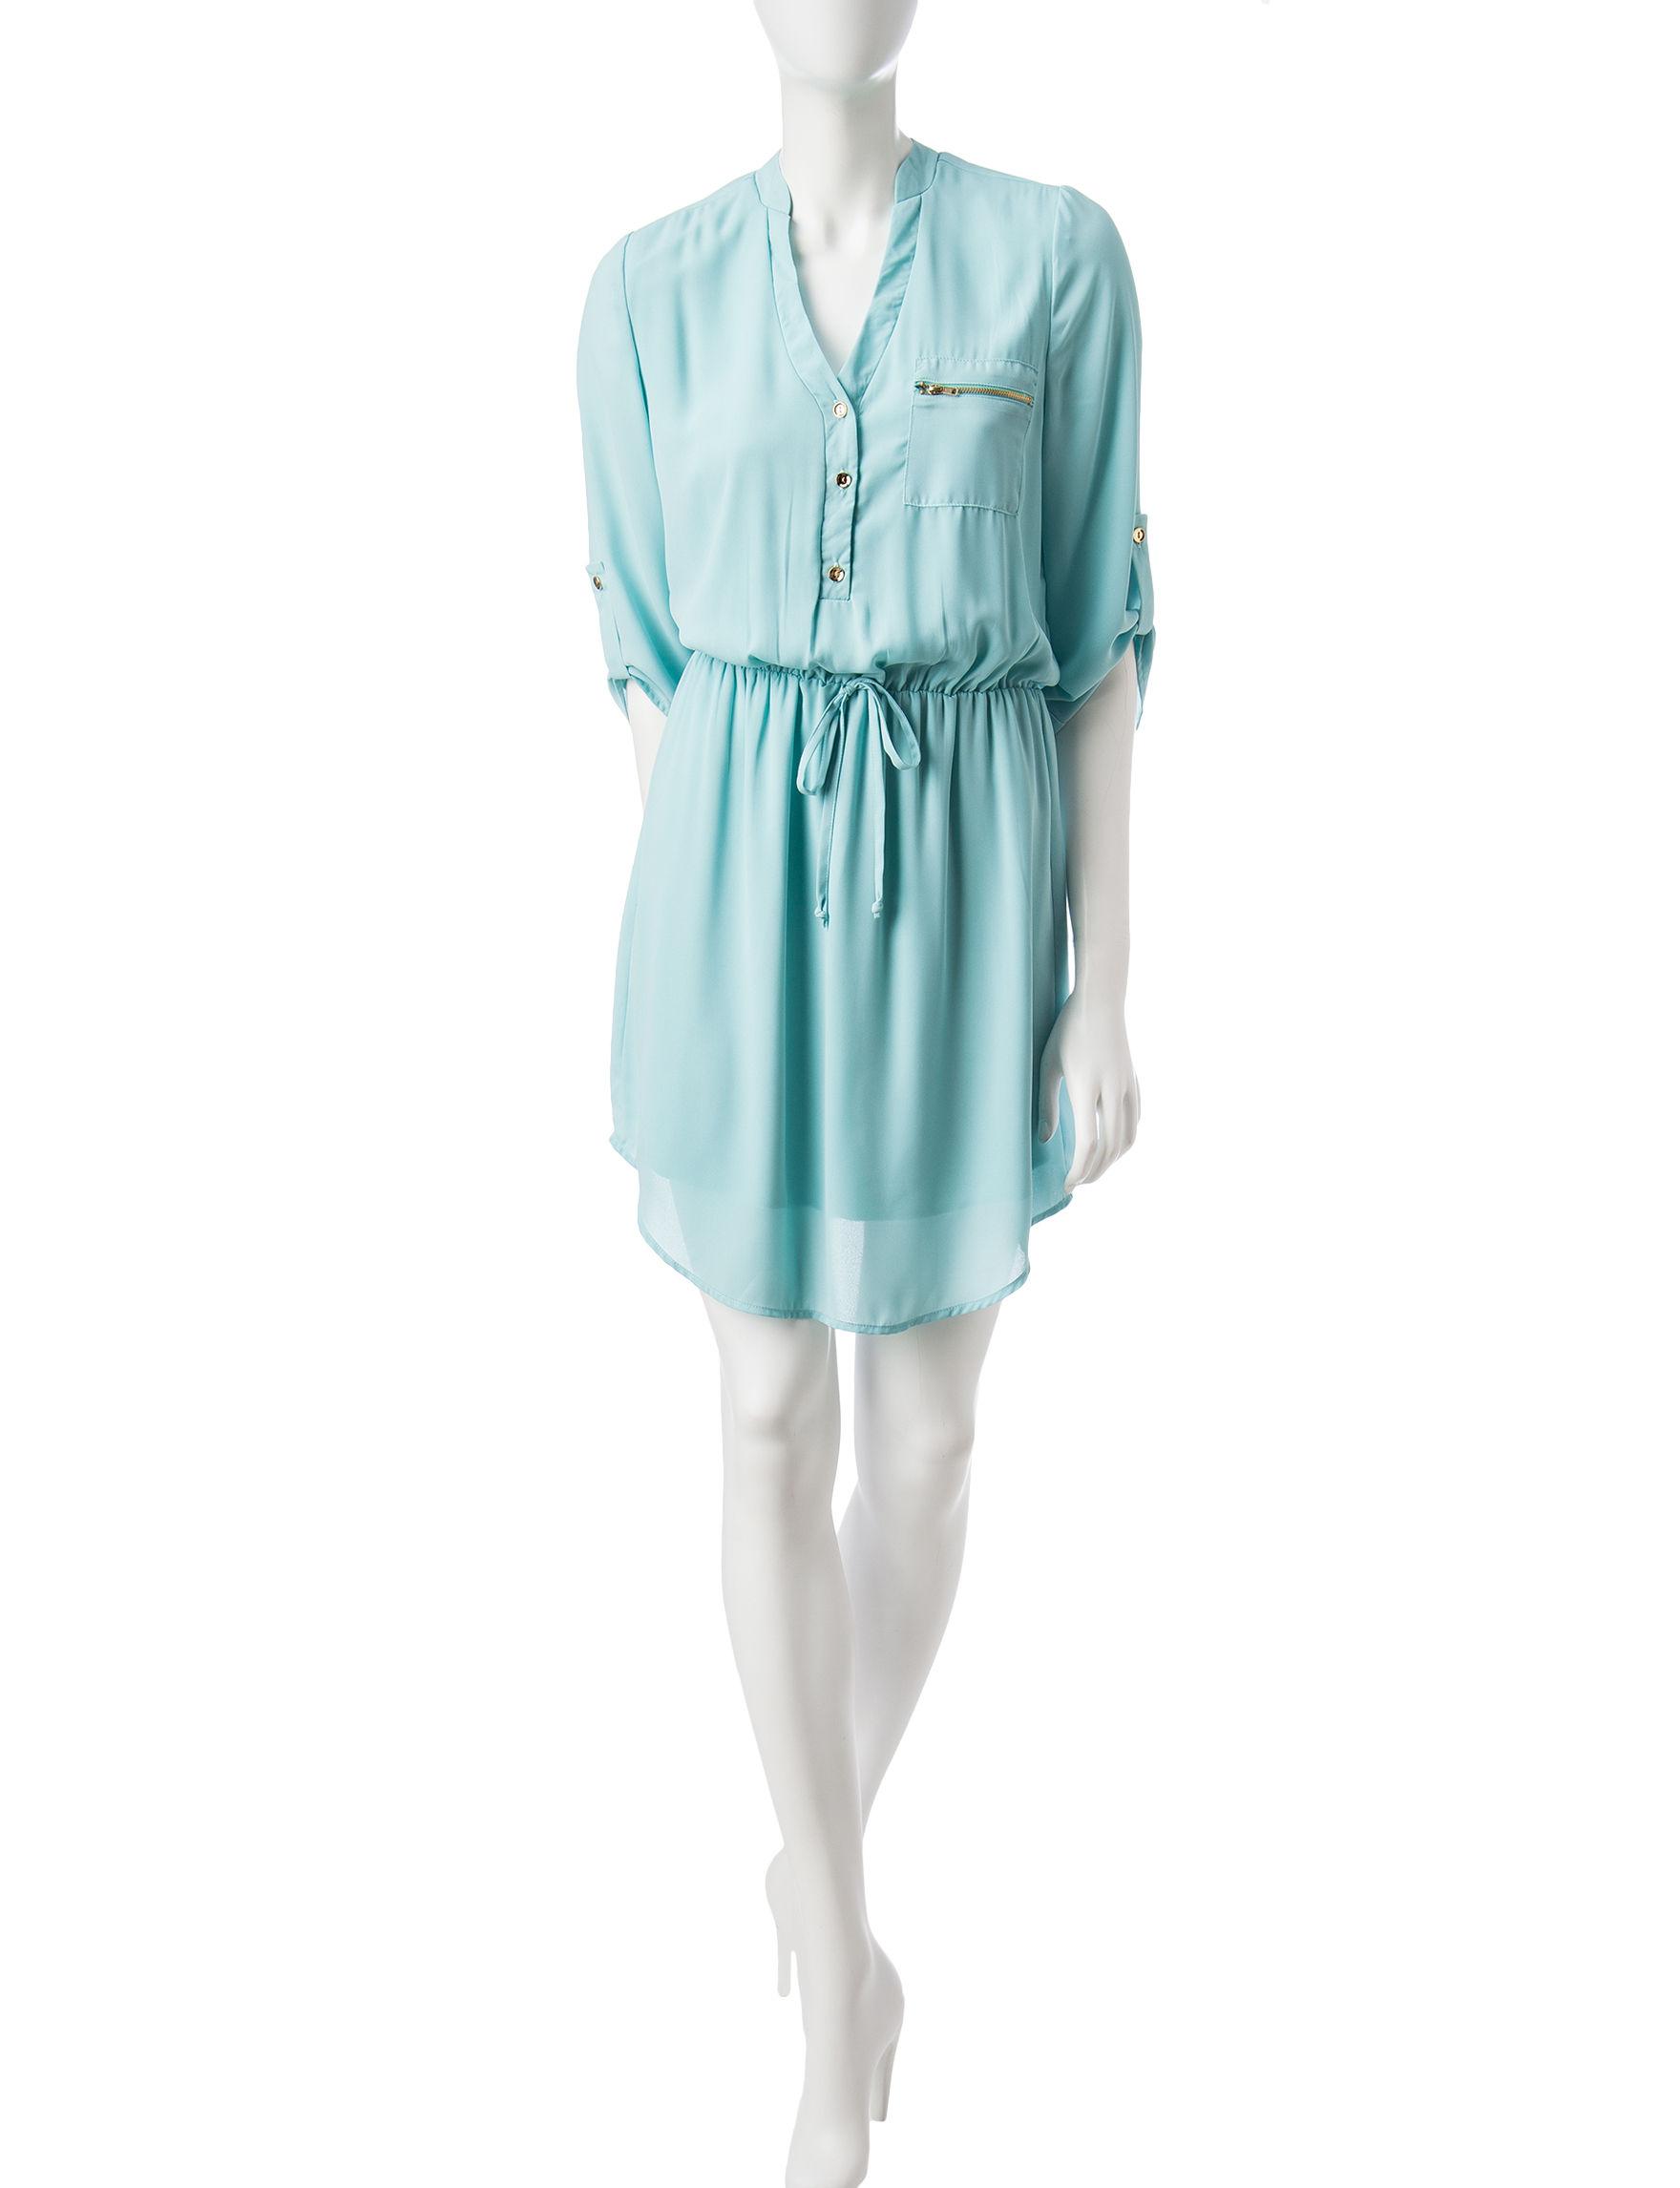 Wishful Park Green Everyday & Casual Shirt Dresses